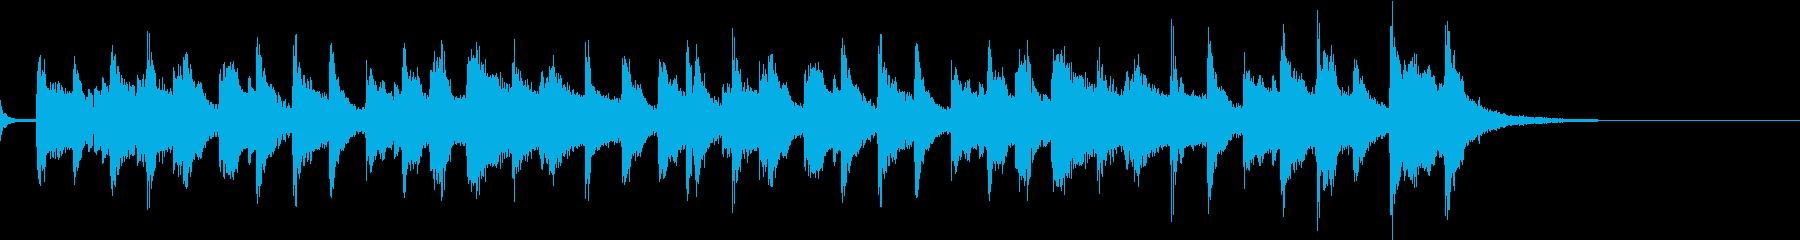 CM・通販/ウエスタン風・わくわく楽しいの再生済みの波形